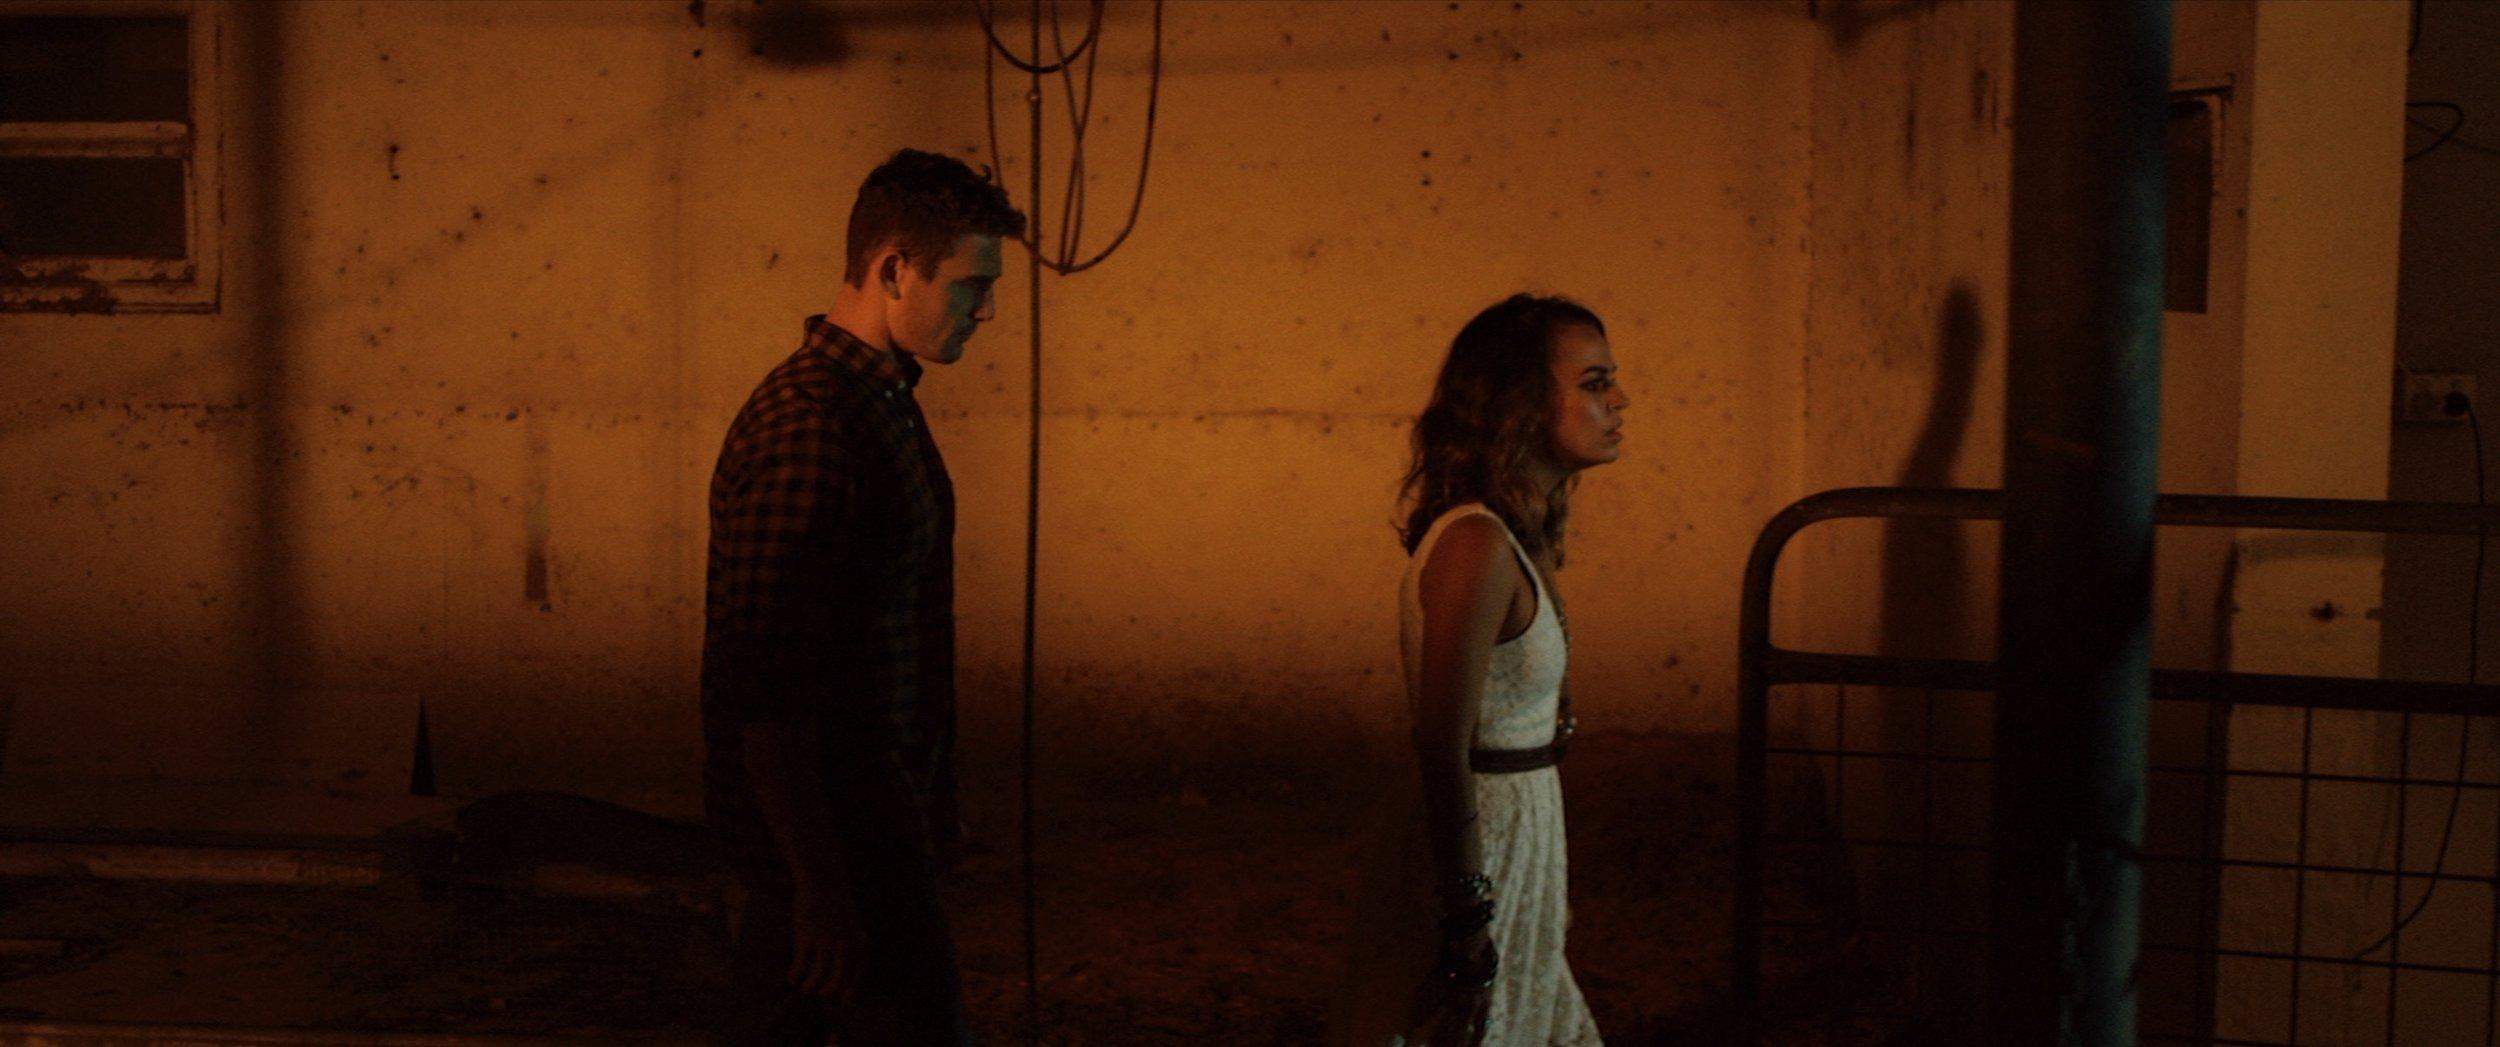 Kate Halpin Director Film - A Private Matter - Bianca Bradey 9